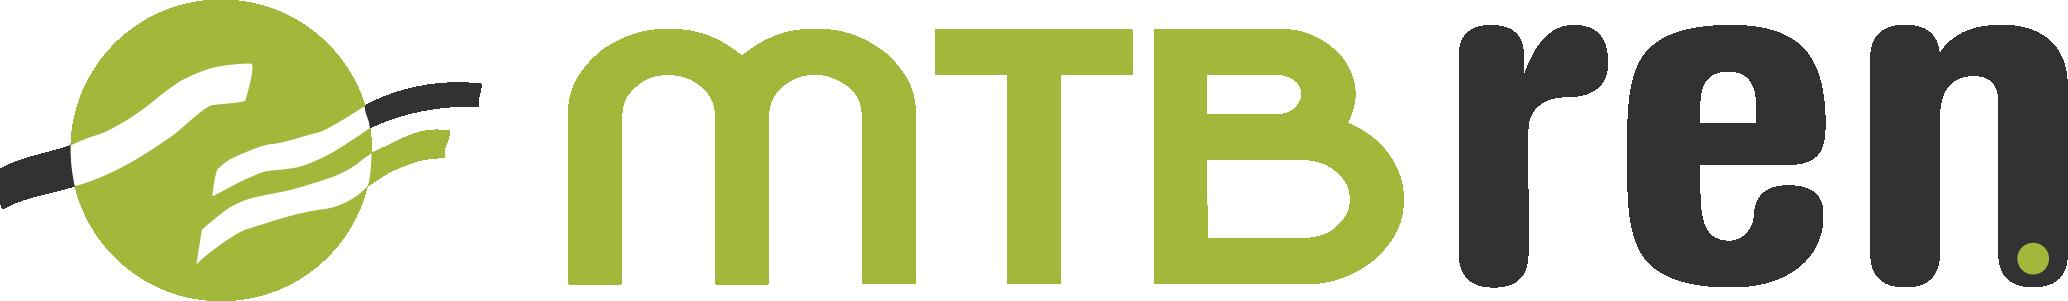 MTBren Montebalito Energías Renovables